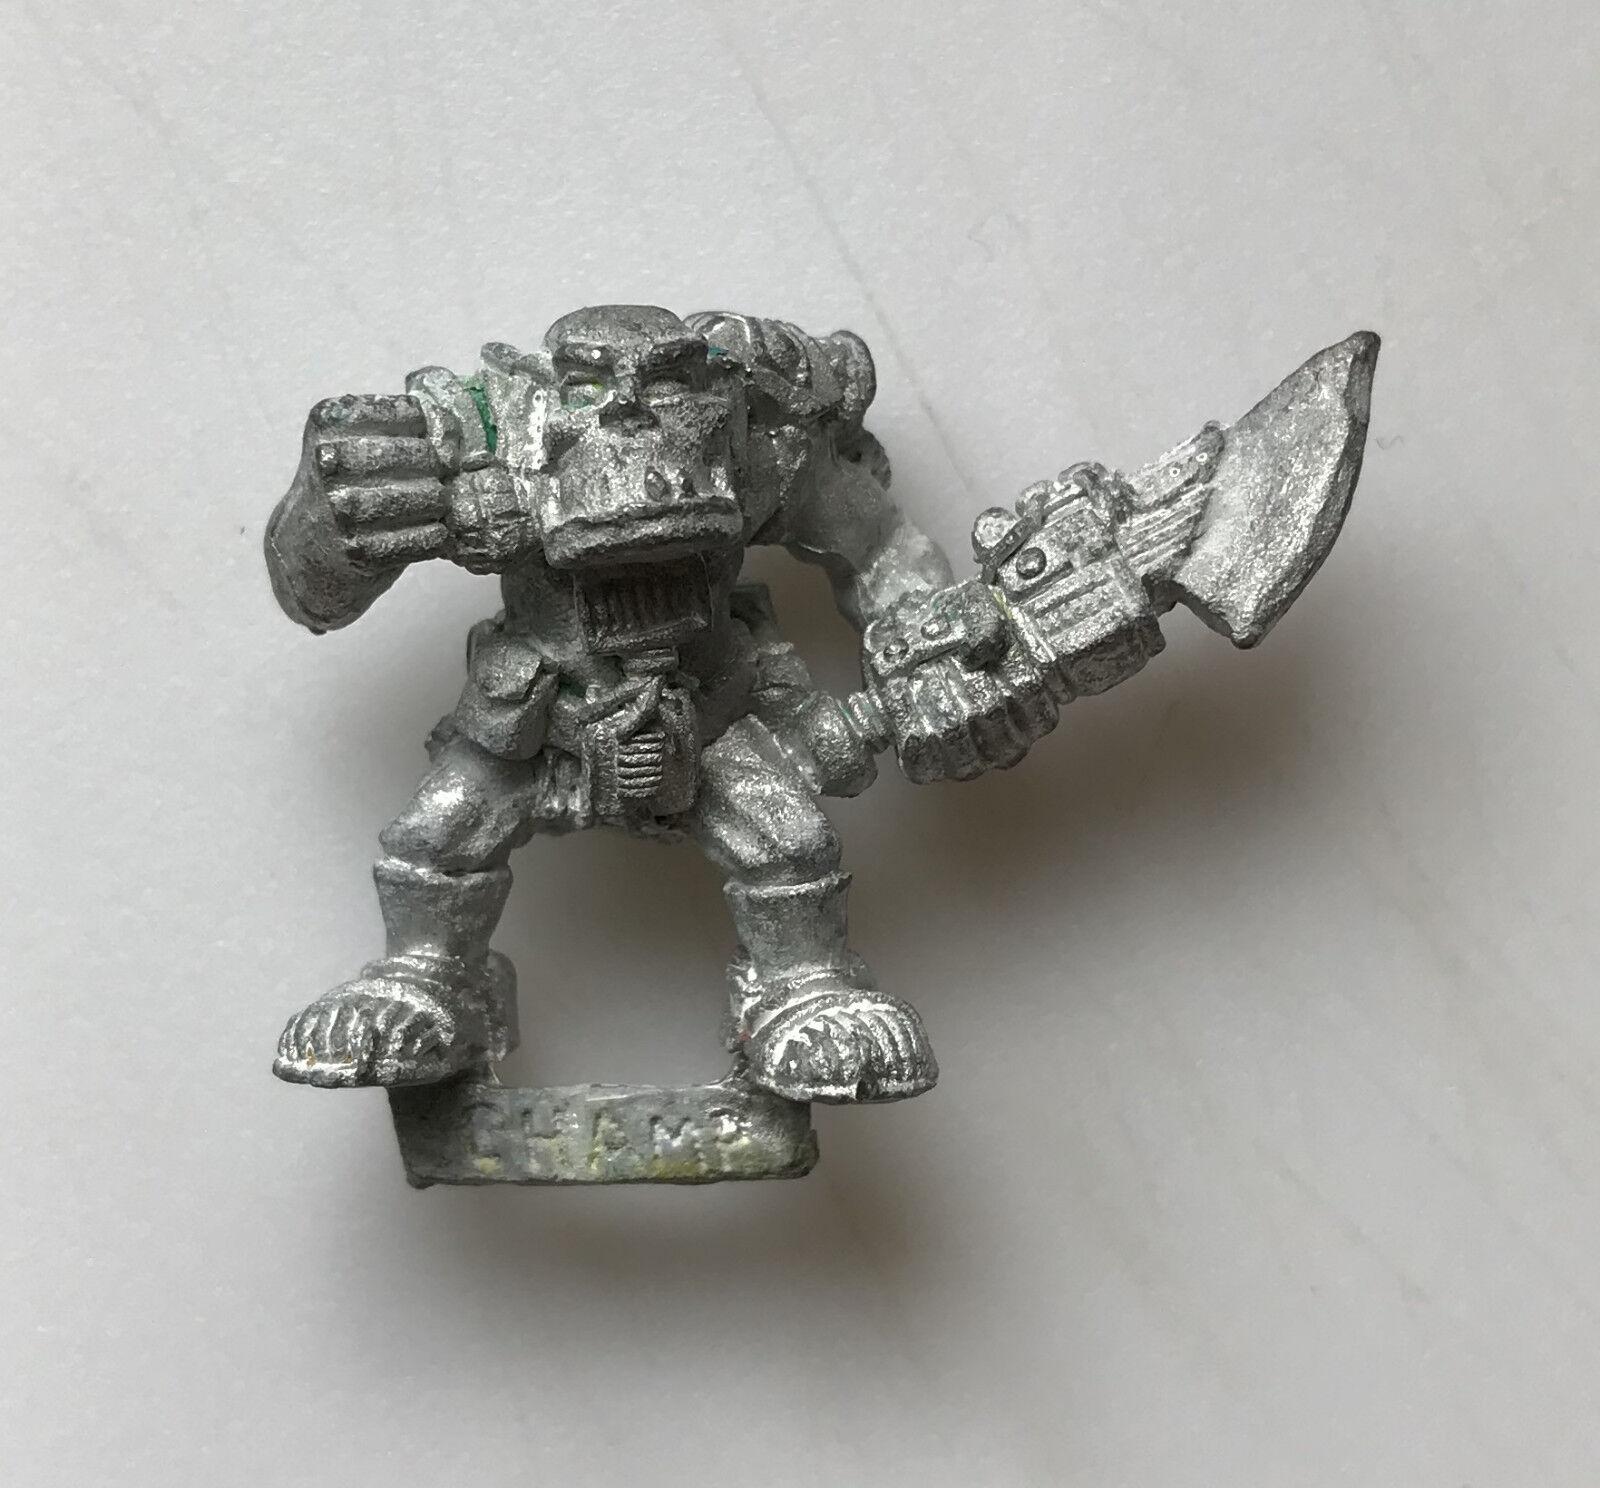 Citadel GW WARHAMMER WARHAMMER WARHAMMER 40K Rogue Trader espacio Ork Raiders Classic Metal tropas e721e2